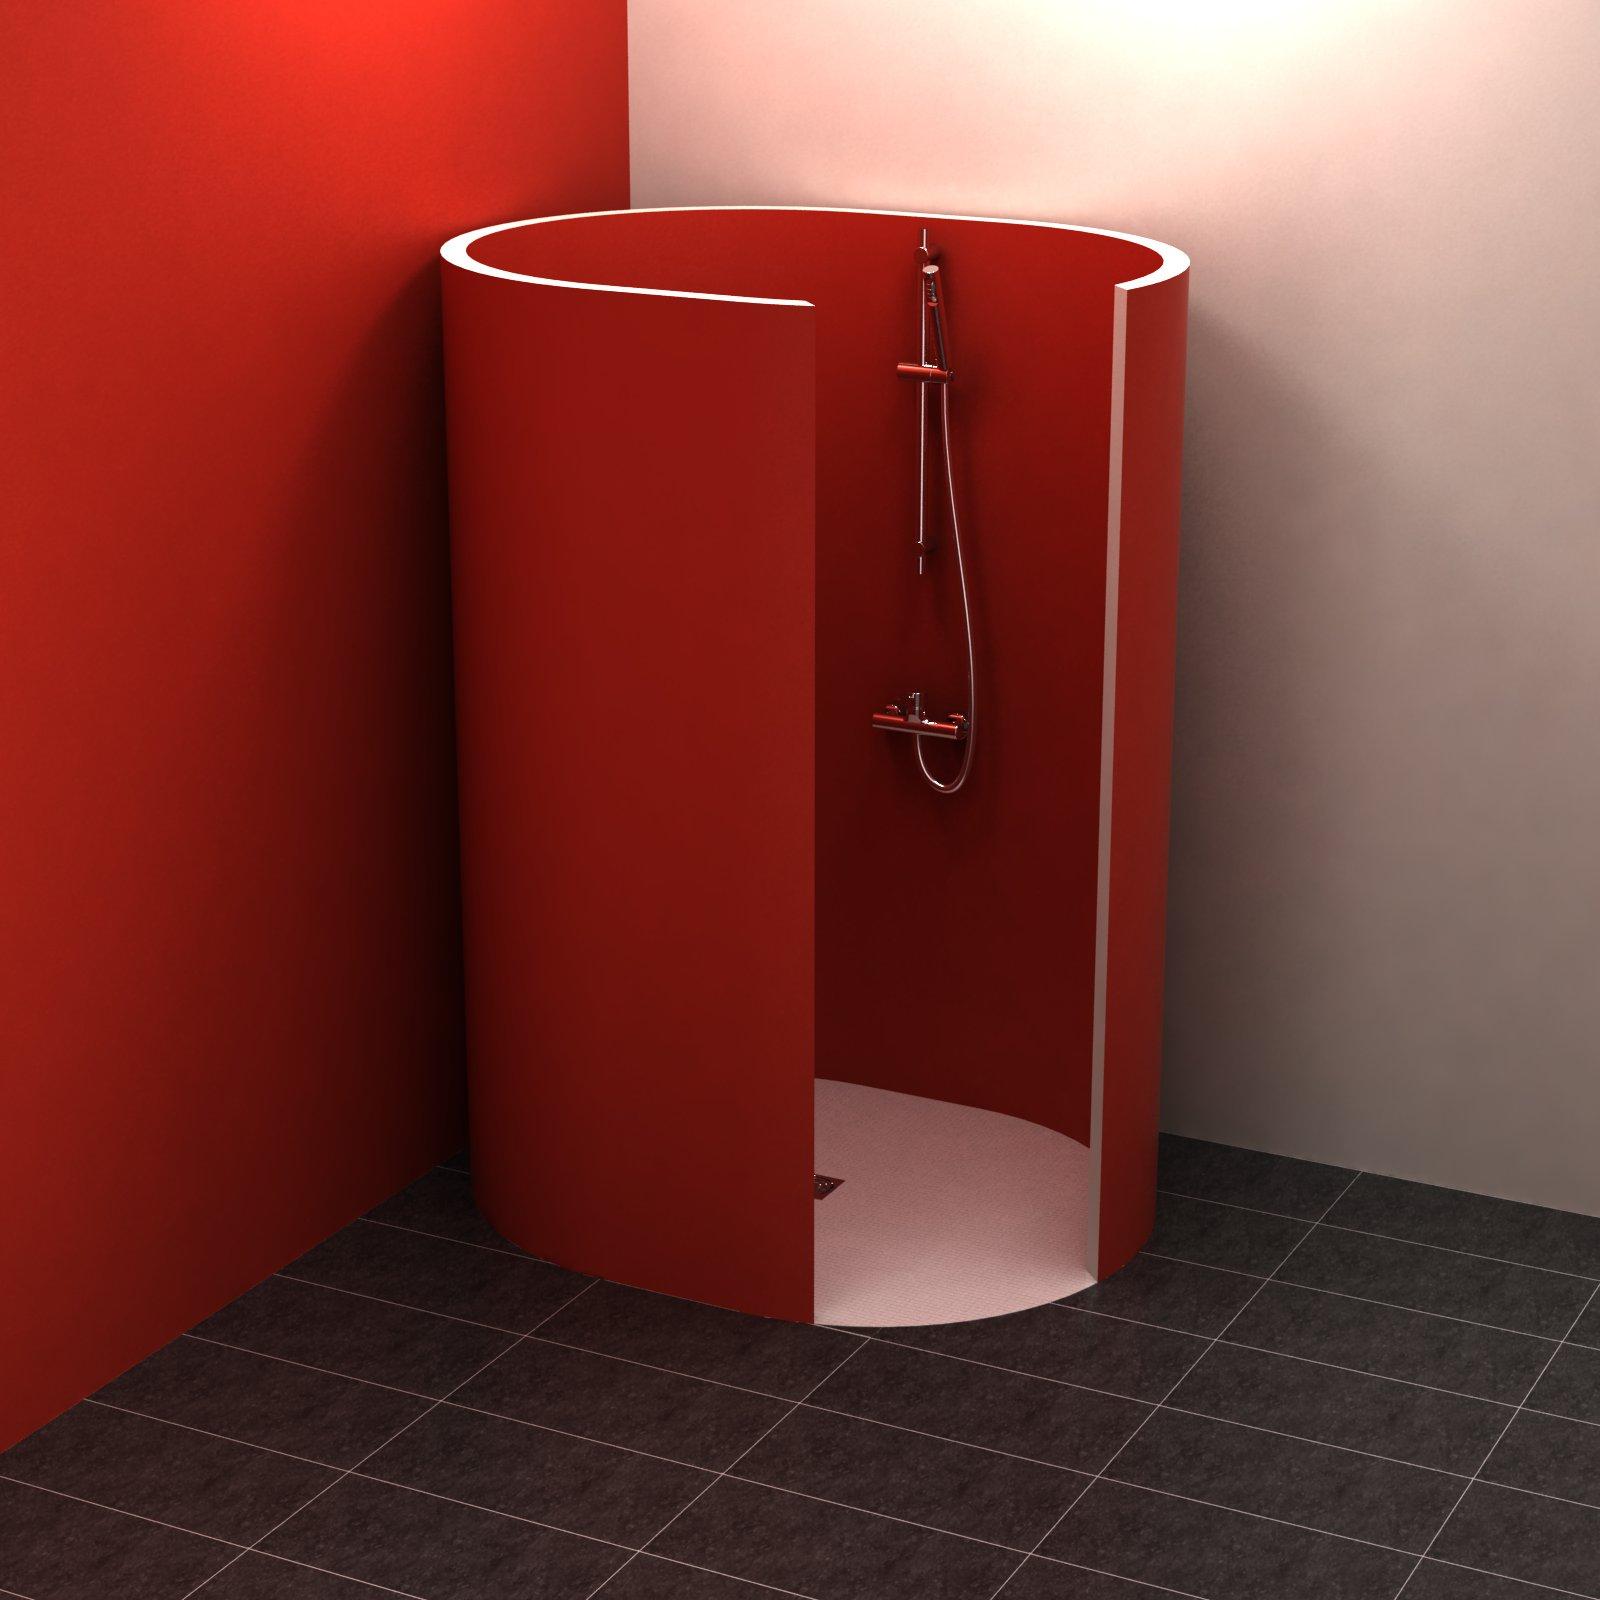 ondo 150x120 cm rundduschen befliesbar duschkabinen duschw nde. Black Bedroom Furniture Sets. Home Design Ideas